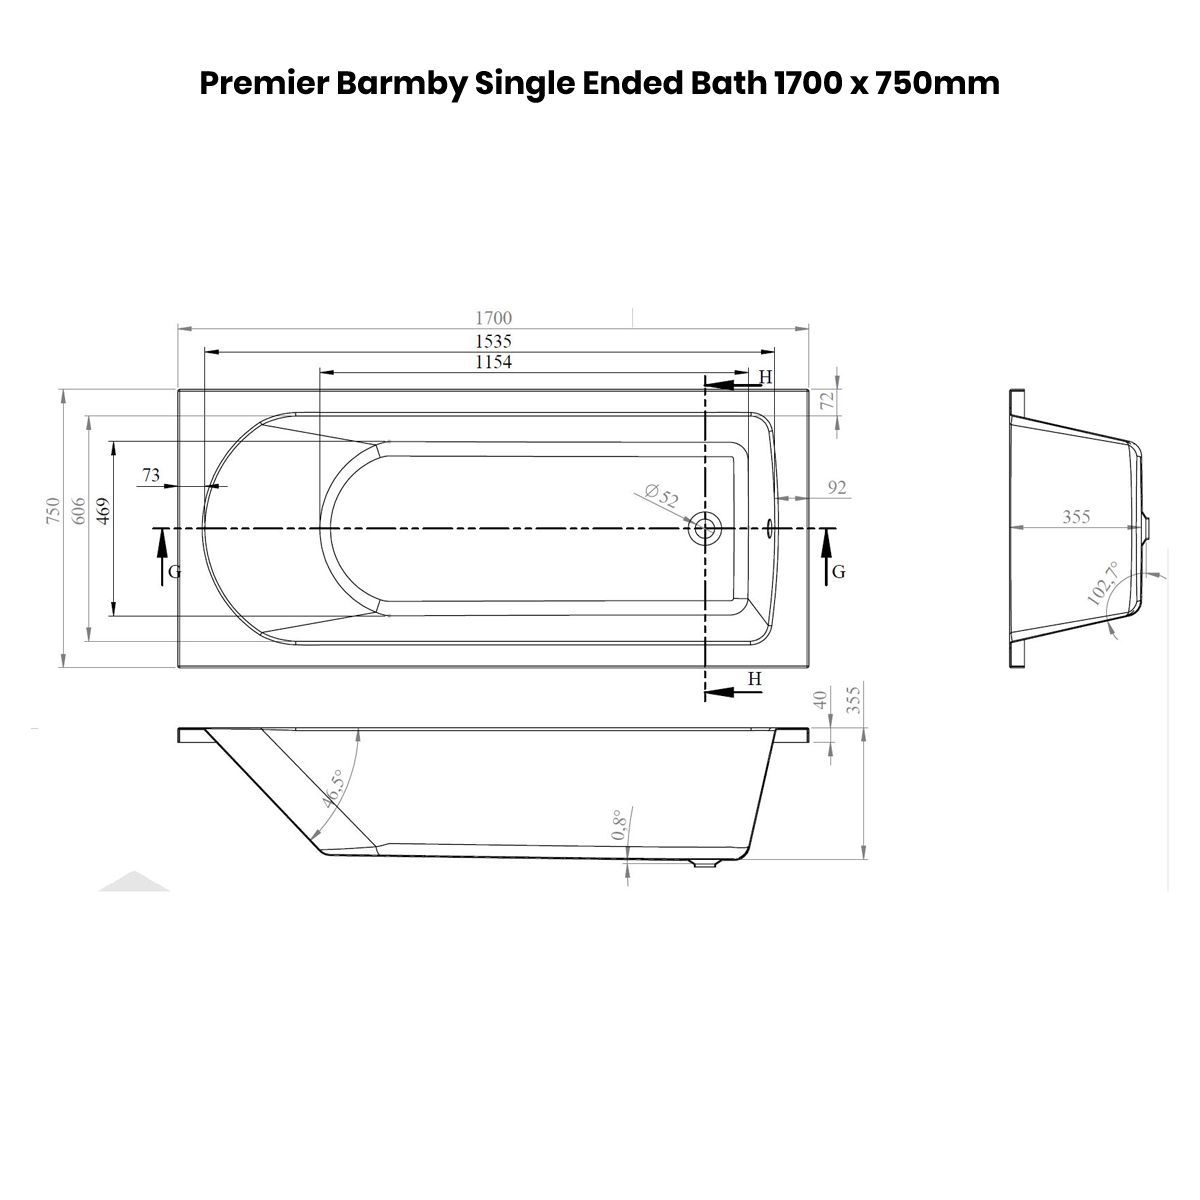 Premier Barmby Single Ended Bath 1700 x 750mm Dimensions